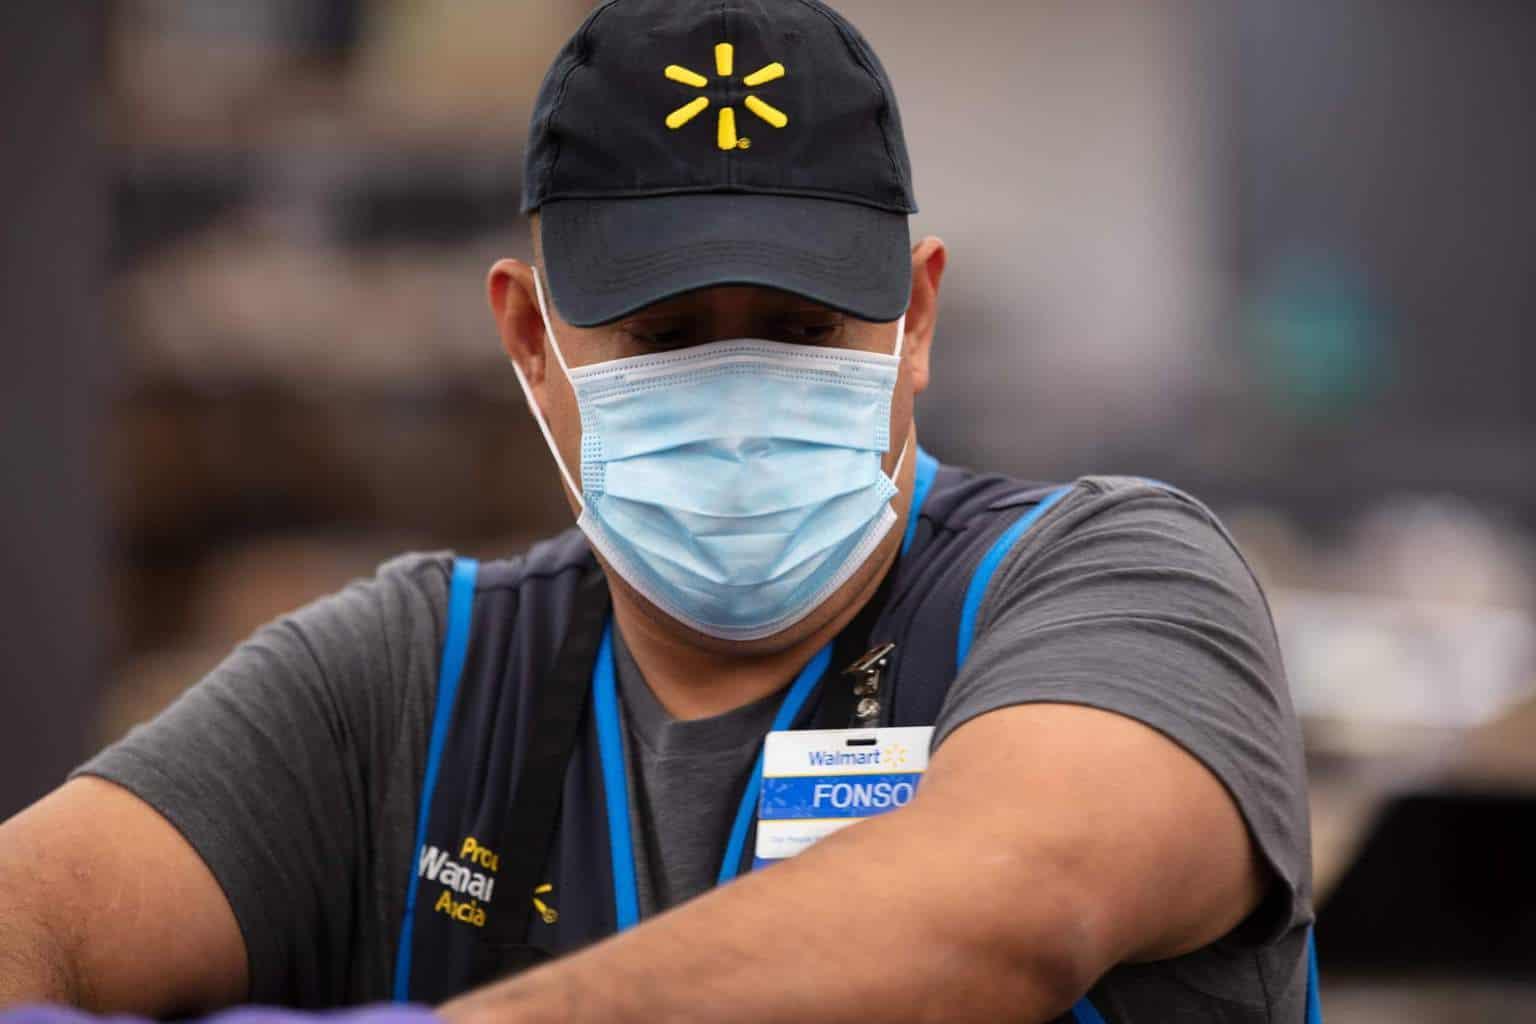 Walmart (WMT) employee